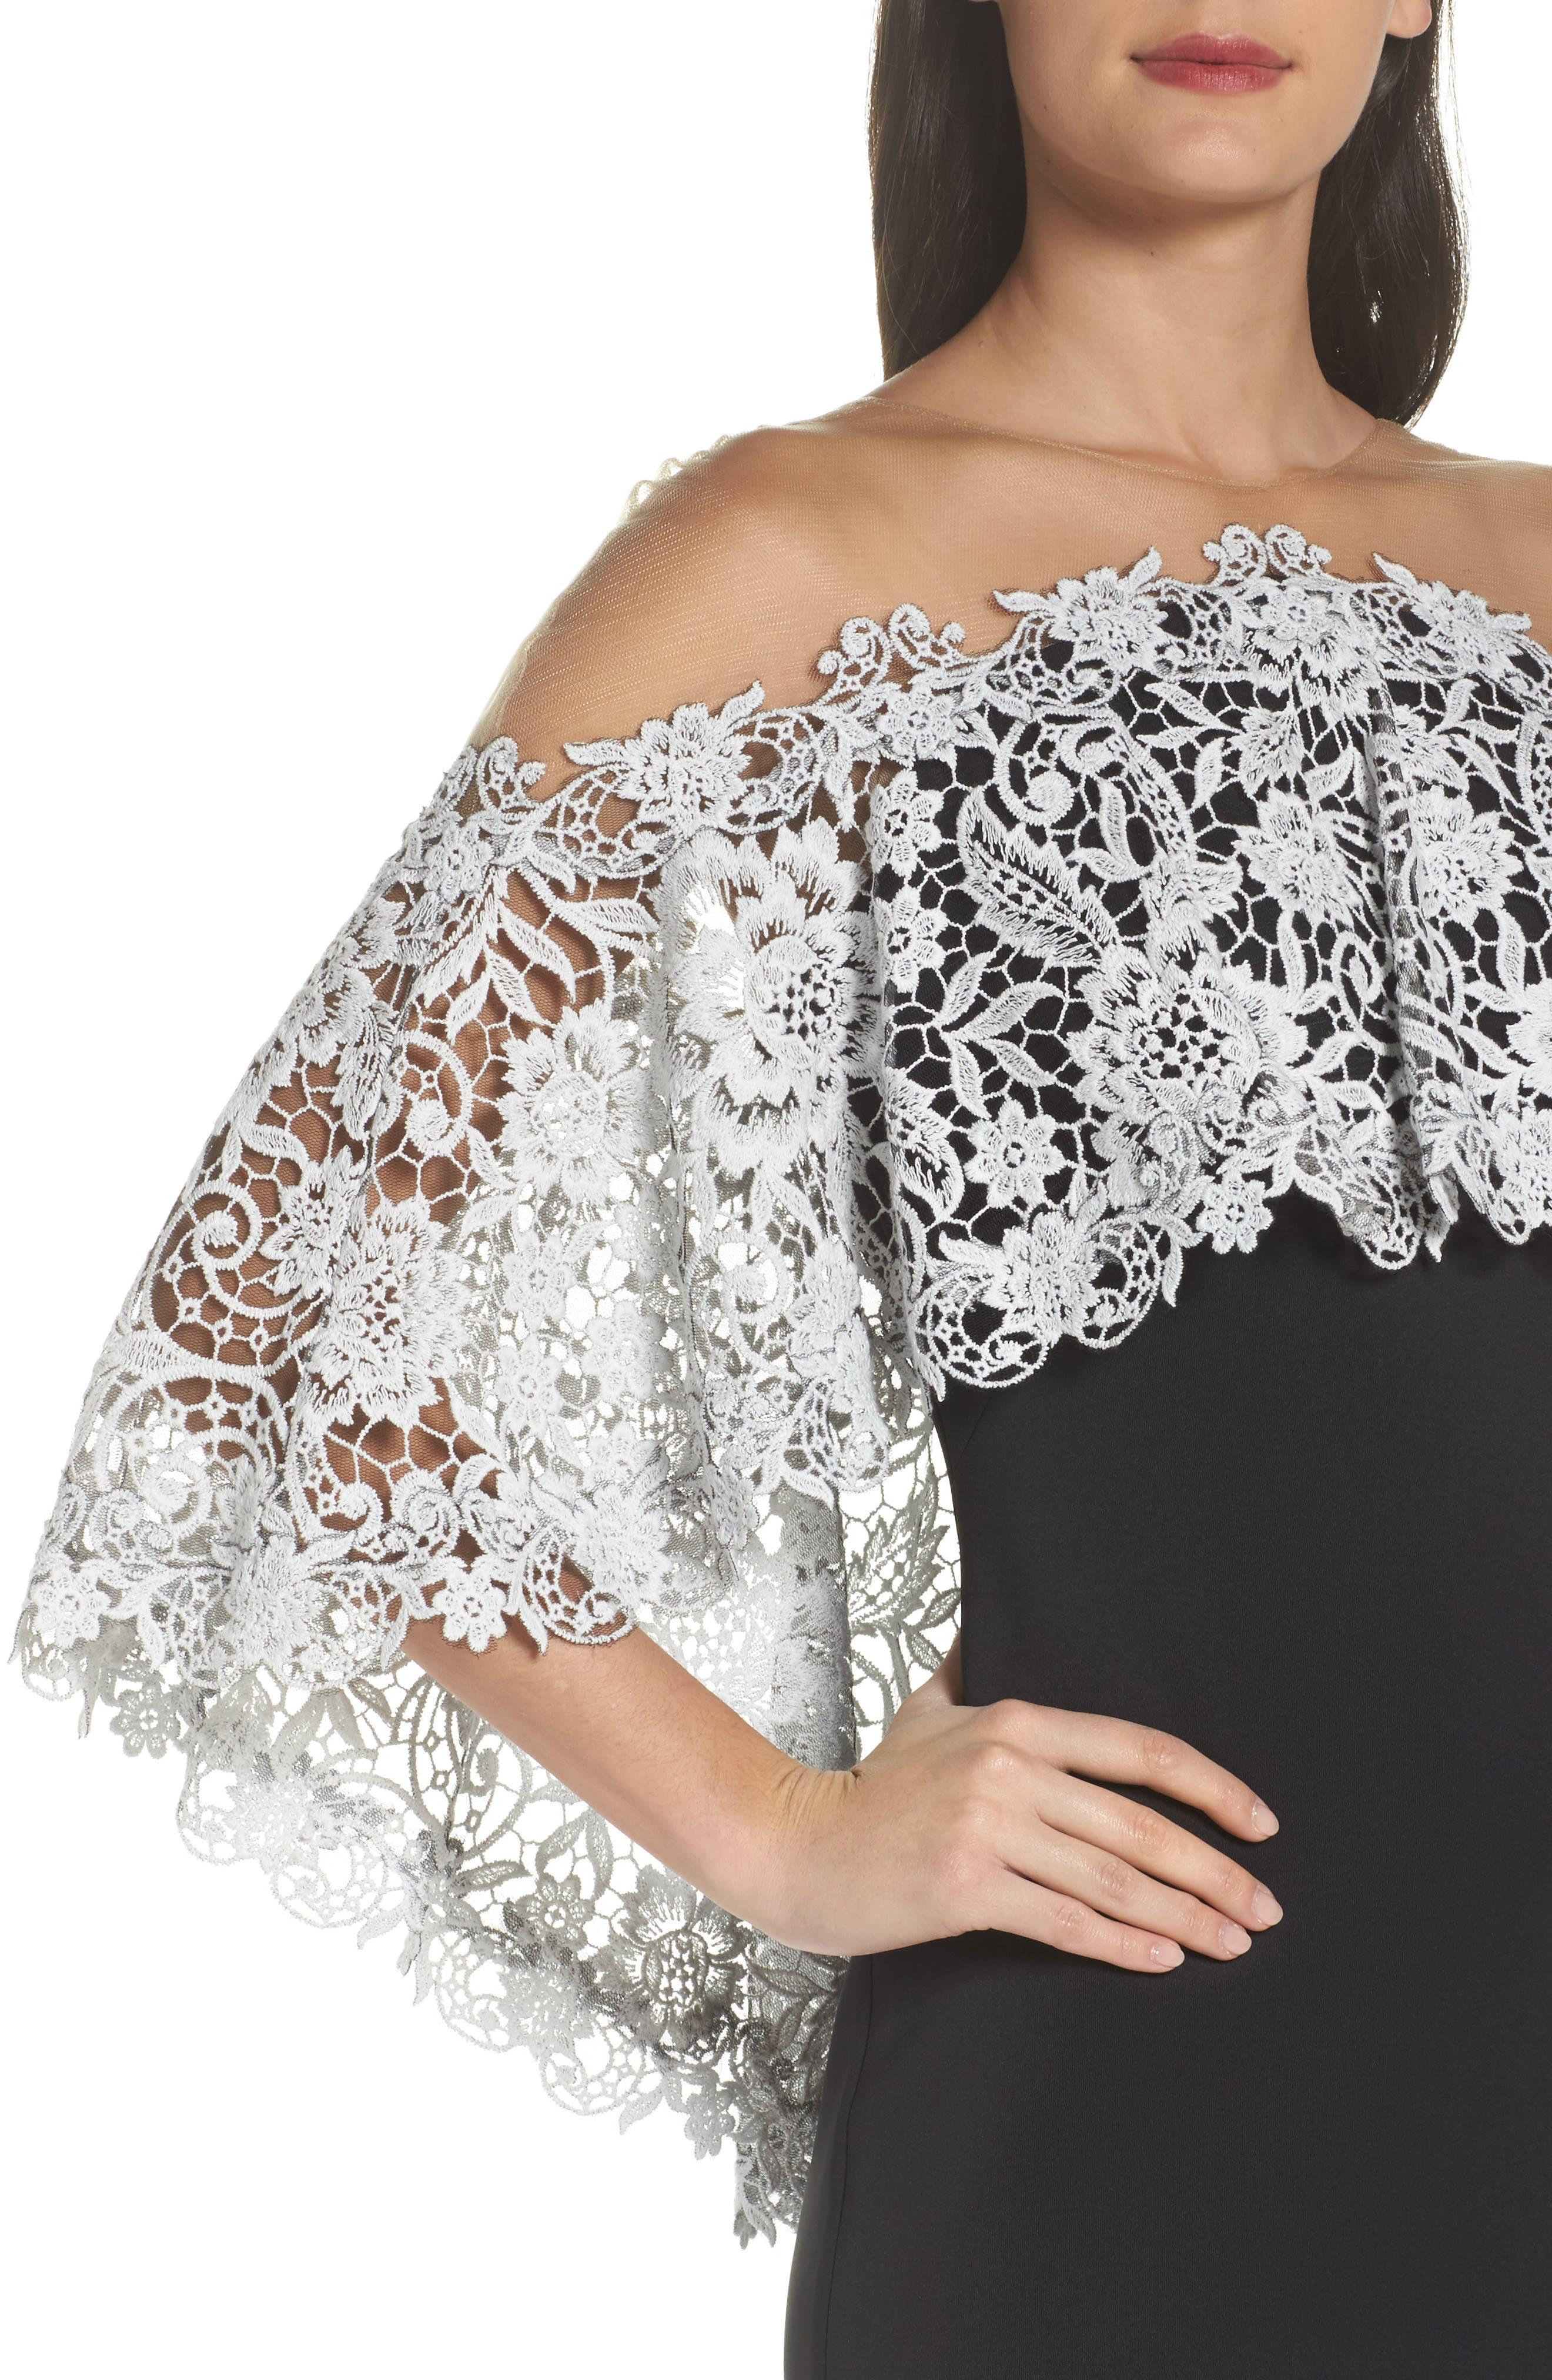 Illusion Neck Cape Dress,                             Alternate thumbnail 4, color,                             Black/ Ivory